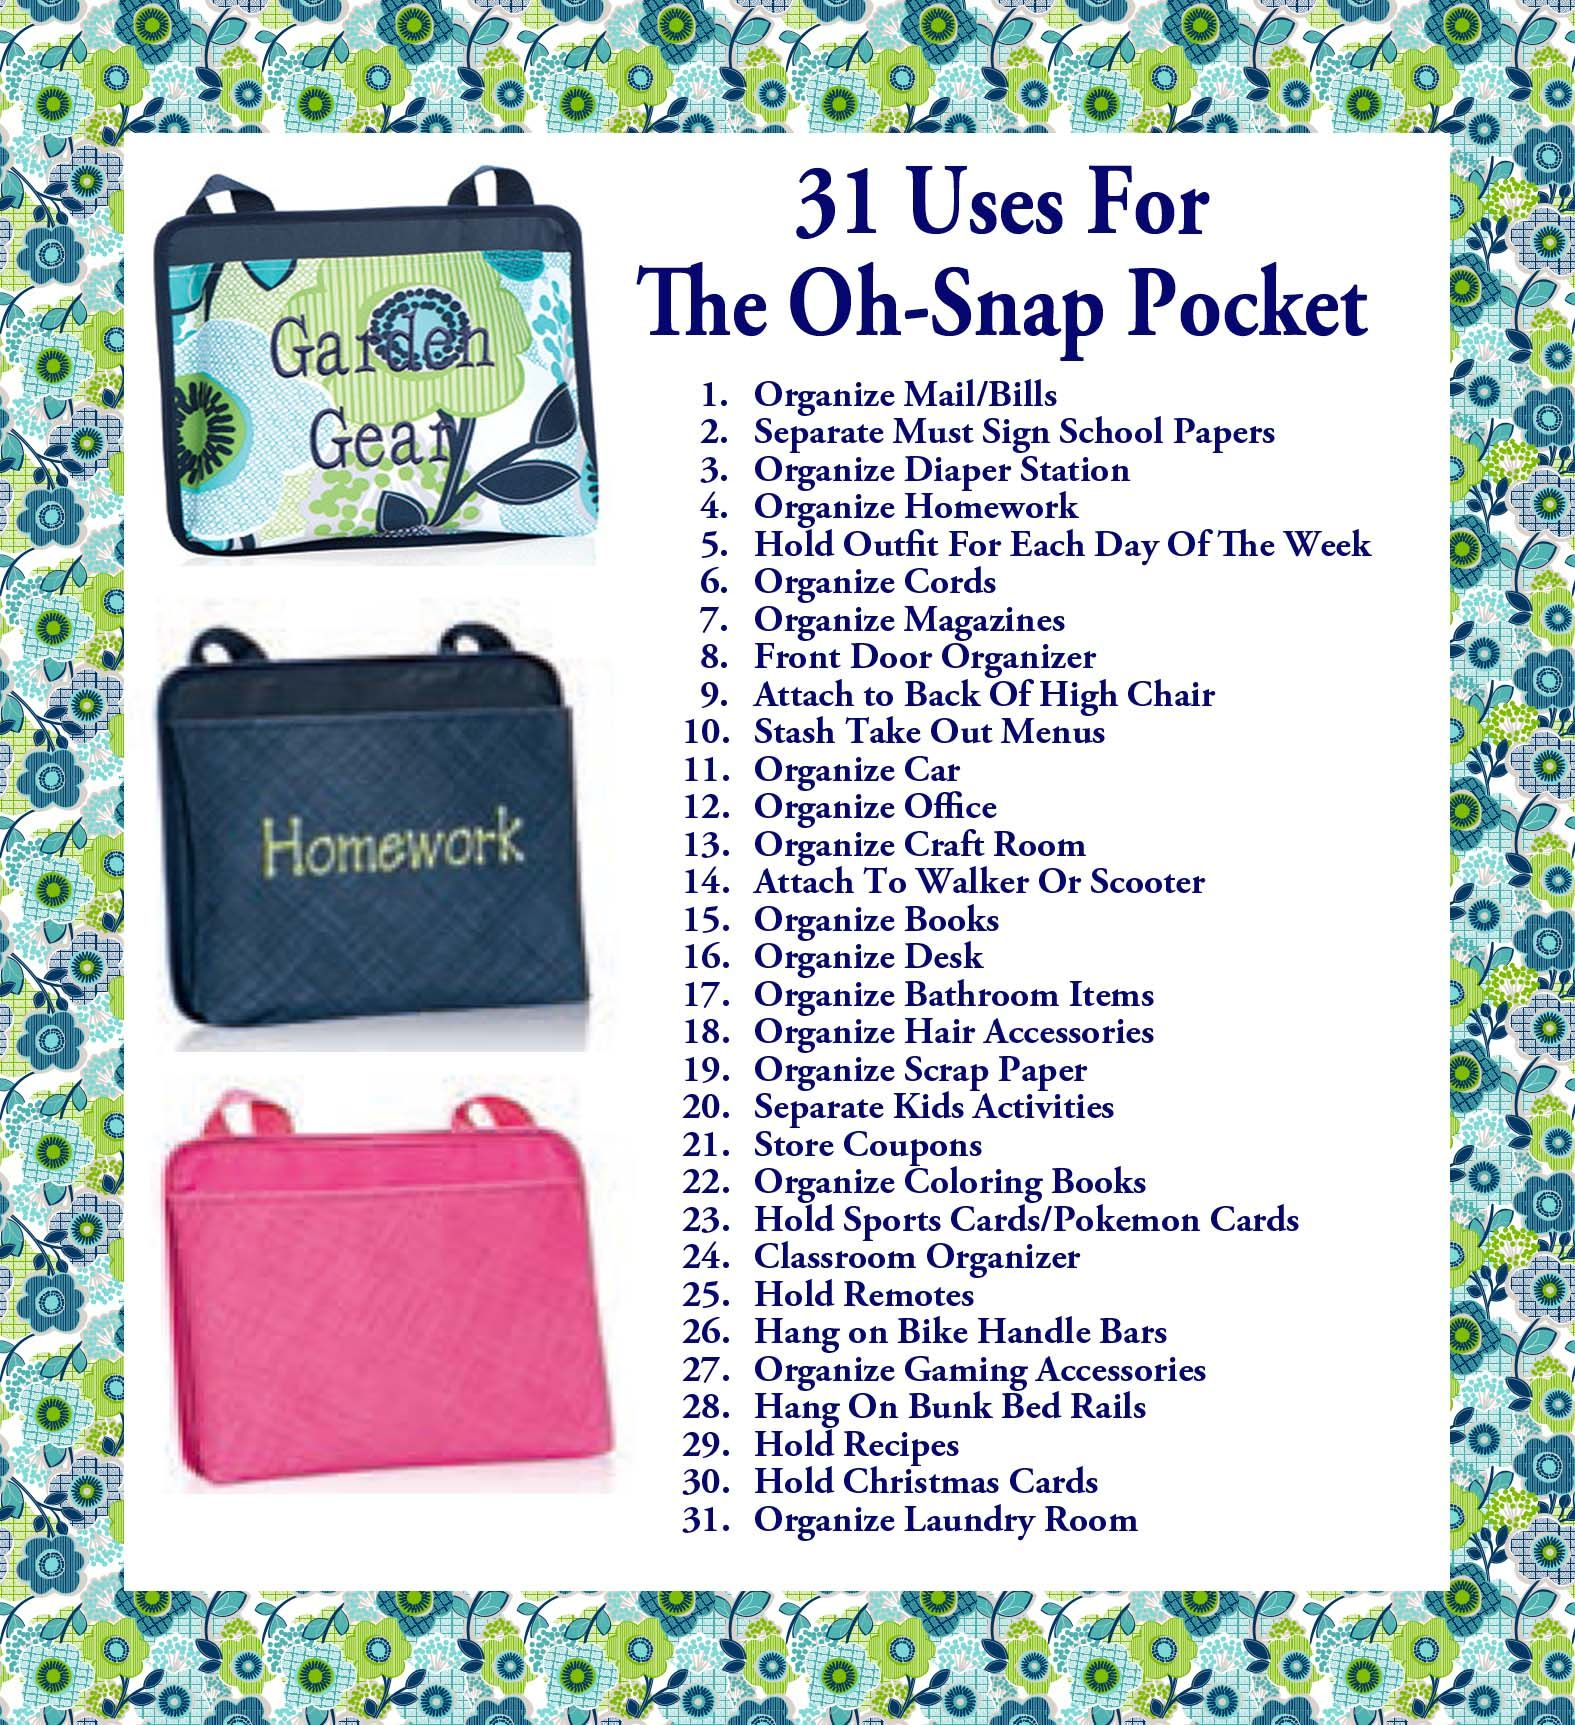 Oh snap bin ideas - 31 Uses For The Oh Snap Pocket Www Mythirtyone Com 1796661